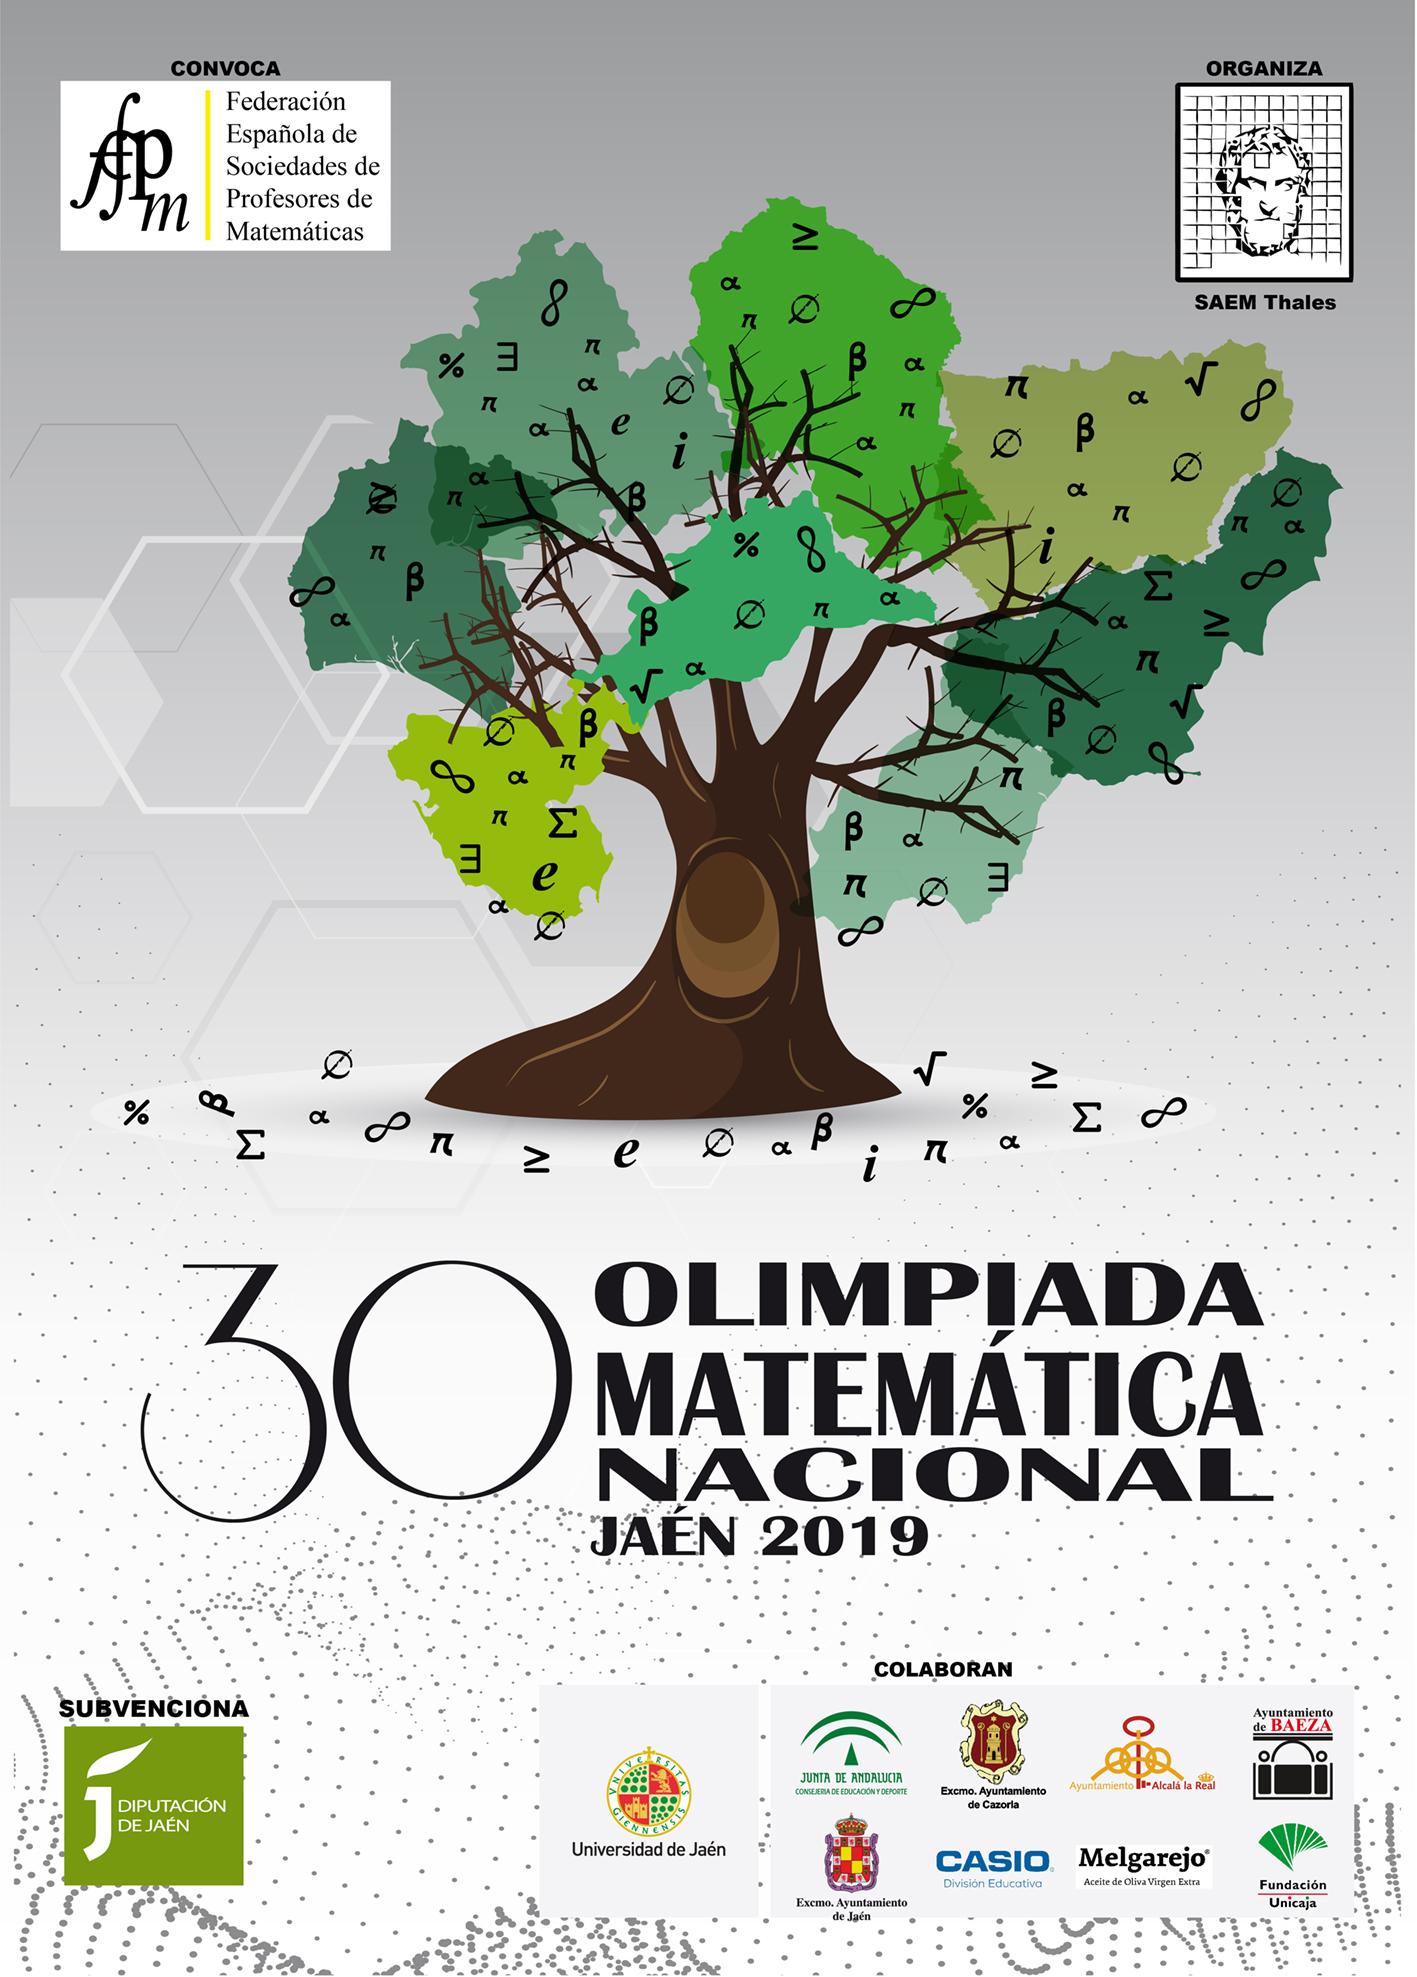 Cartel_XXX_Olimpiada_Nacional_Jaen_2019.jpg